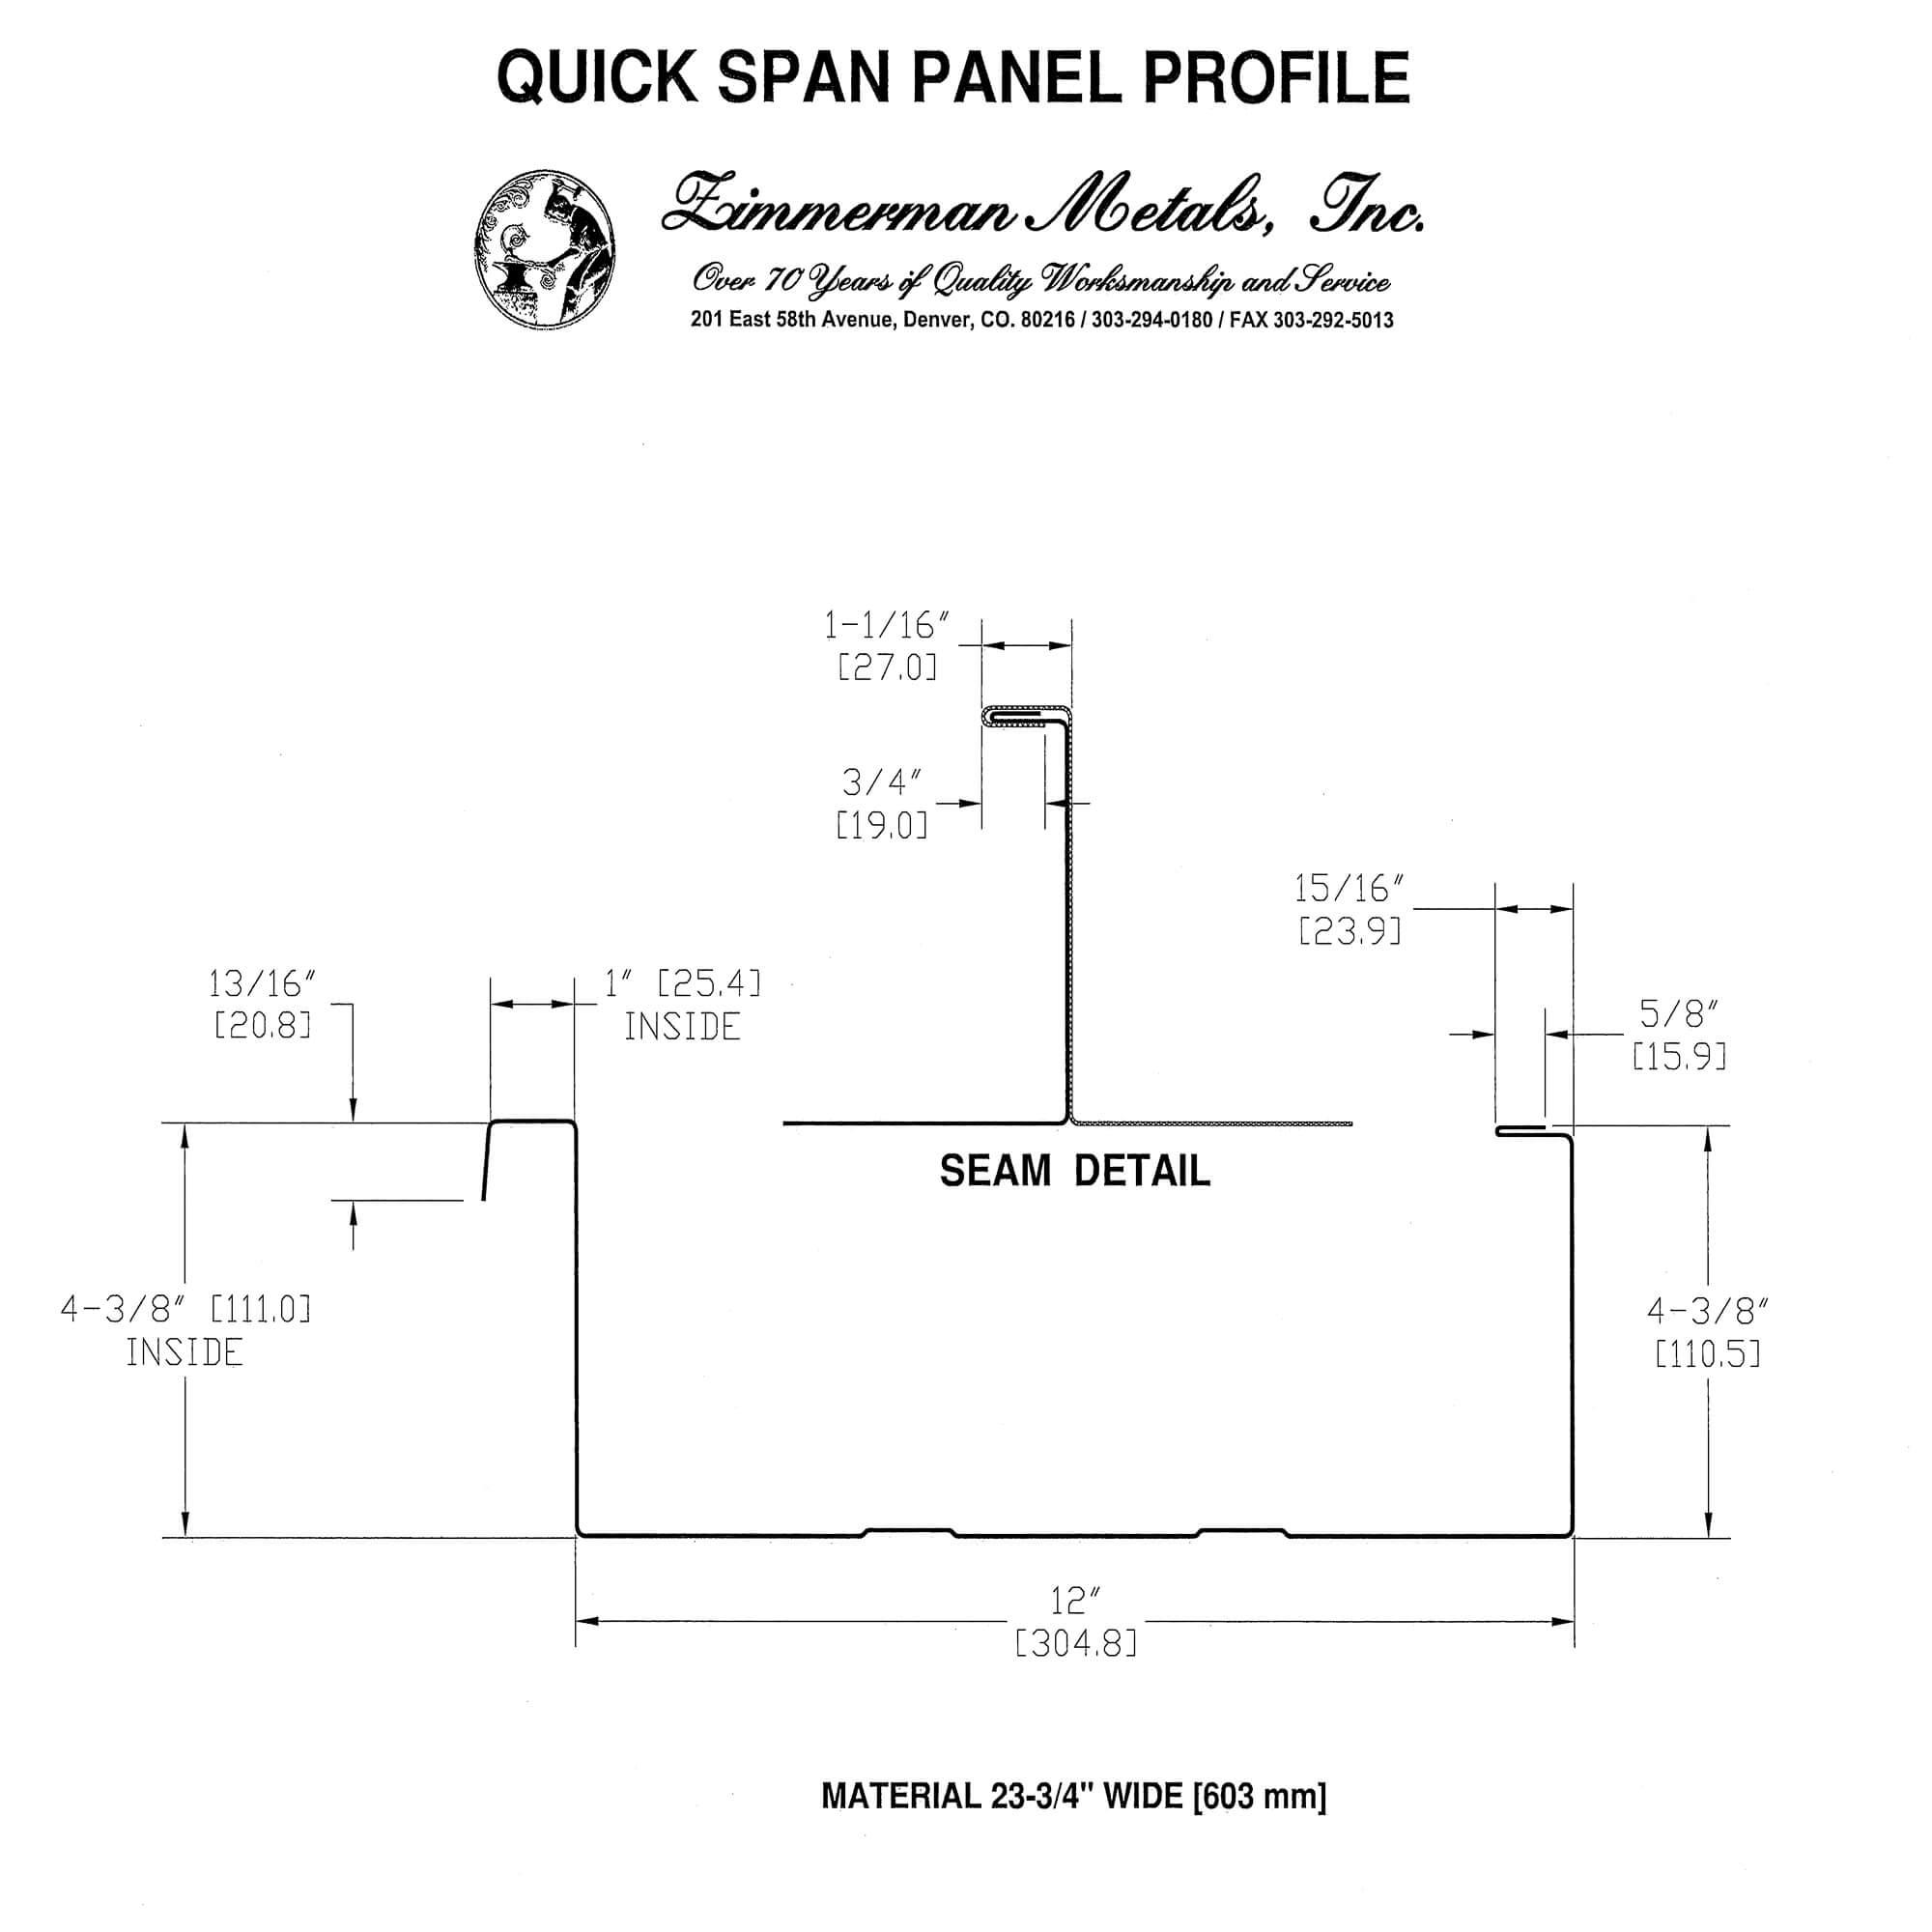 QuickSpan Profile 2014 - EZ Metal